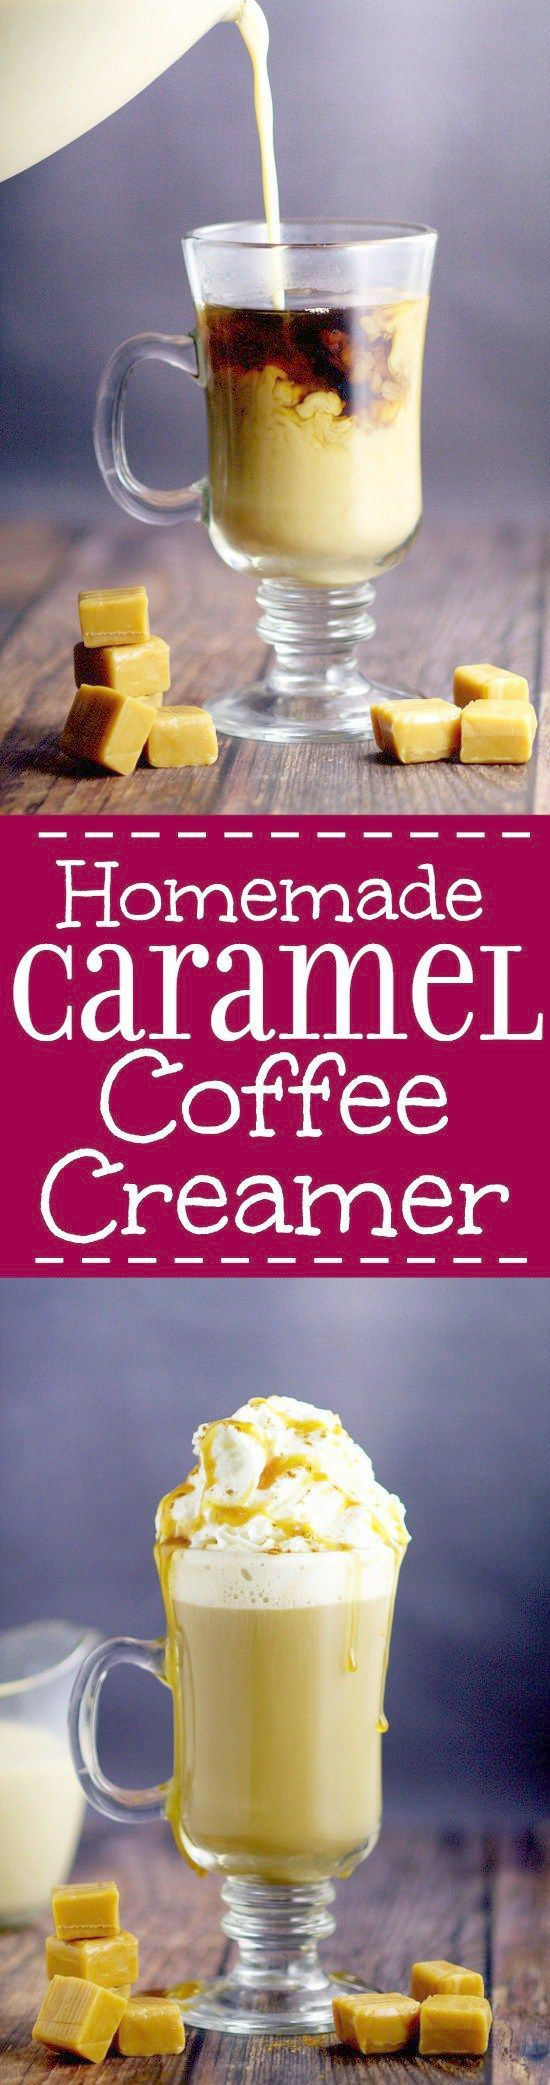 Pin on Morning Coffee Recipes